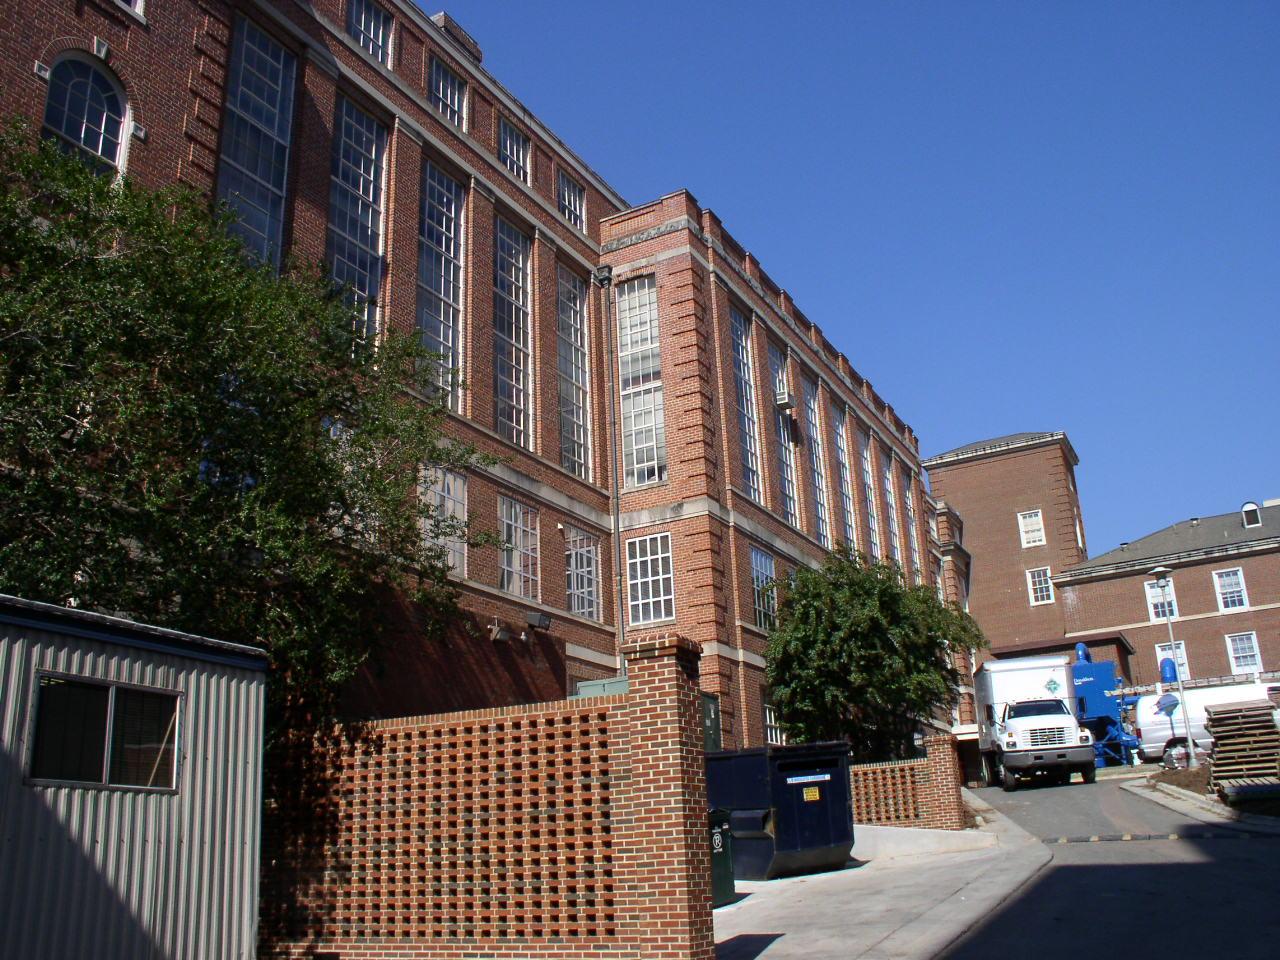 Contemporary Photo of MacNider Hall